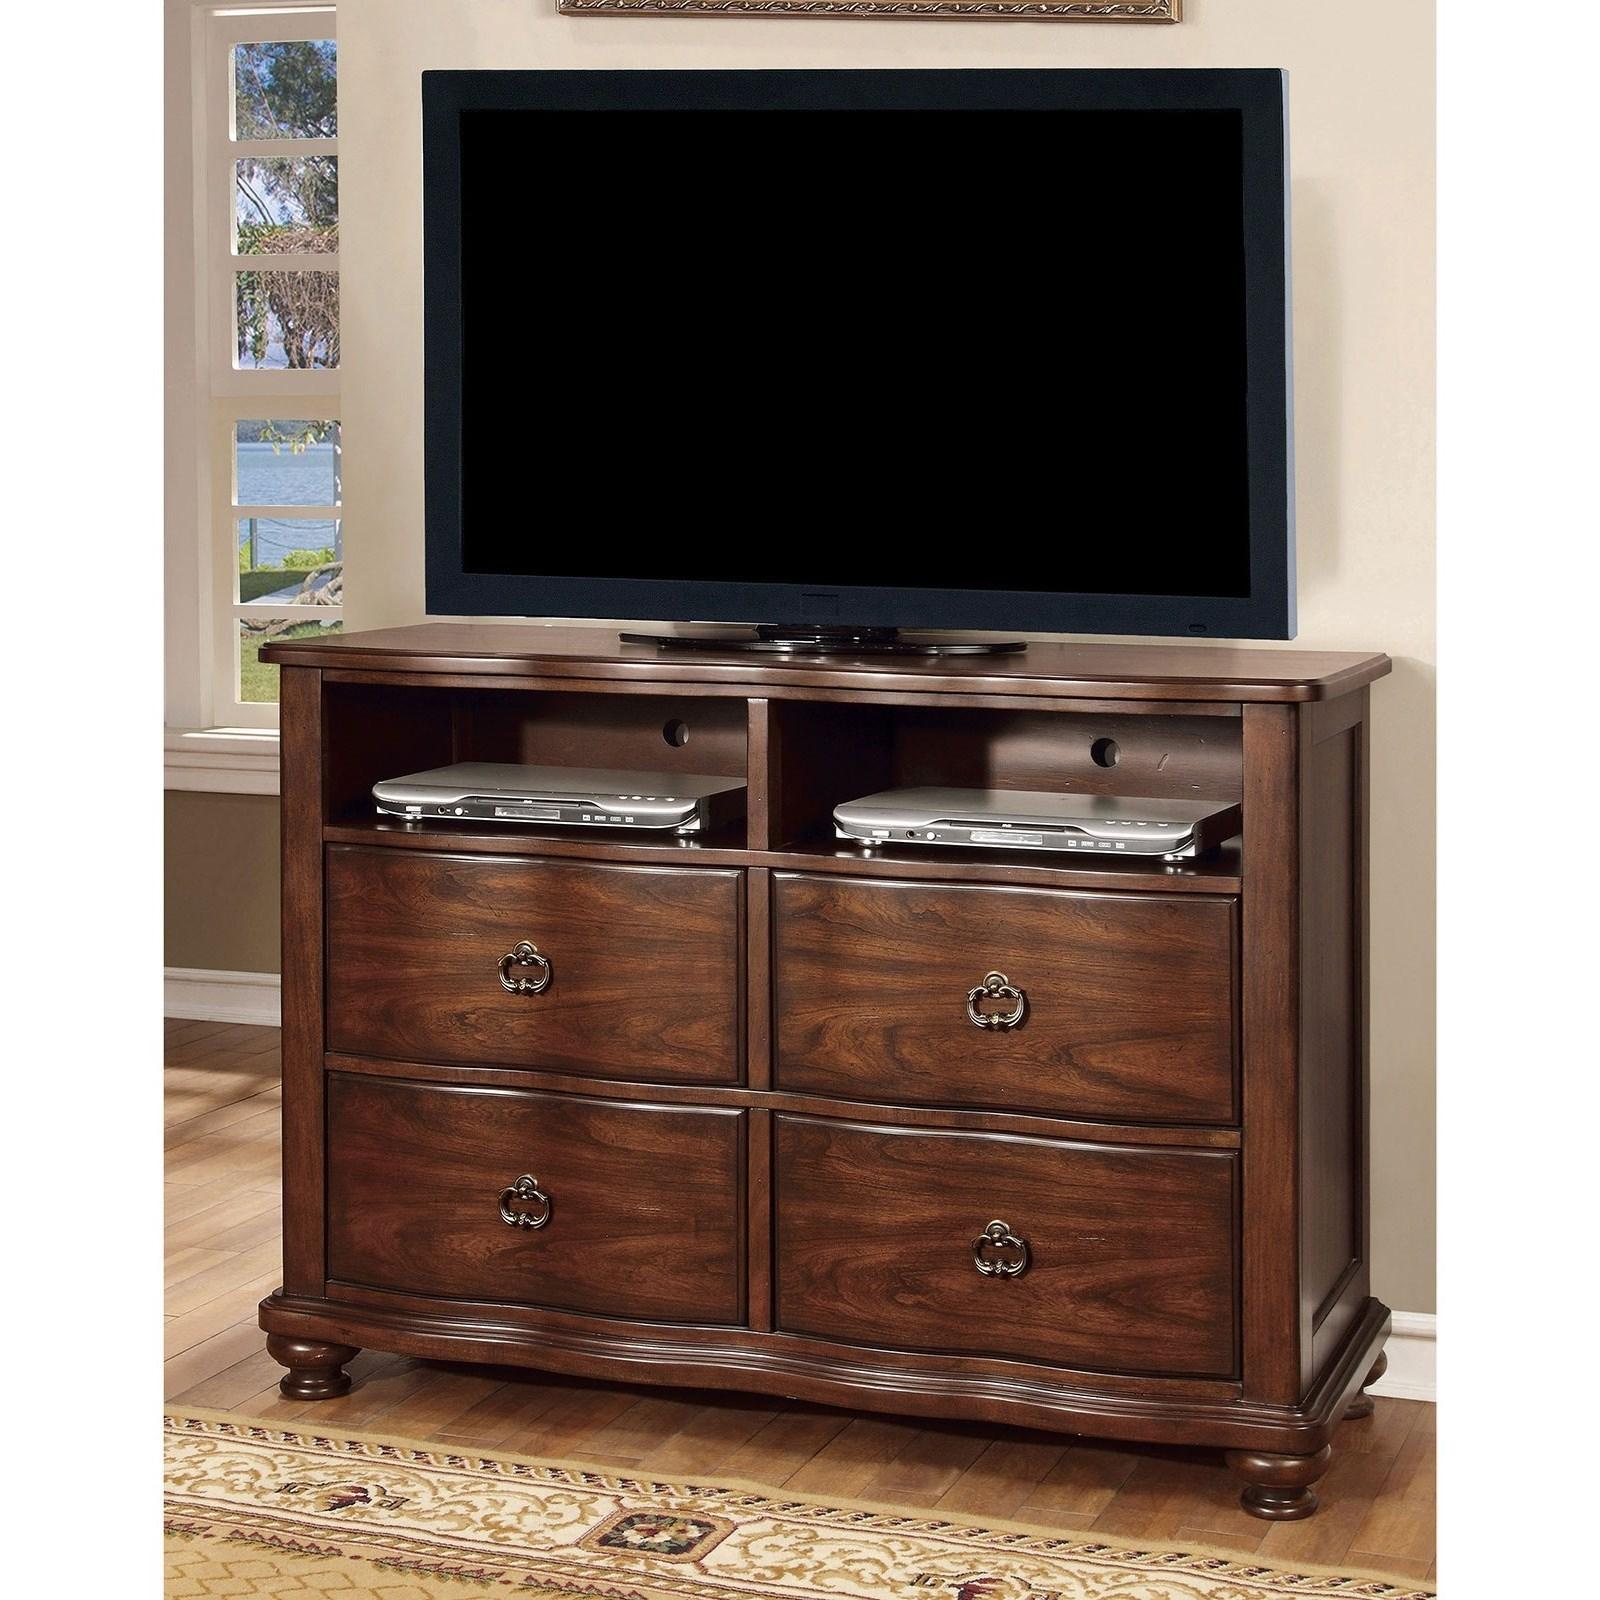 Bellavista Media Chest at Household Furniture